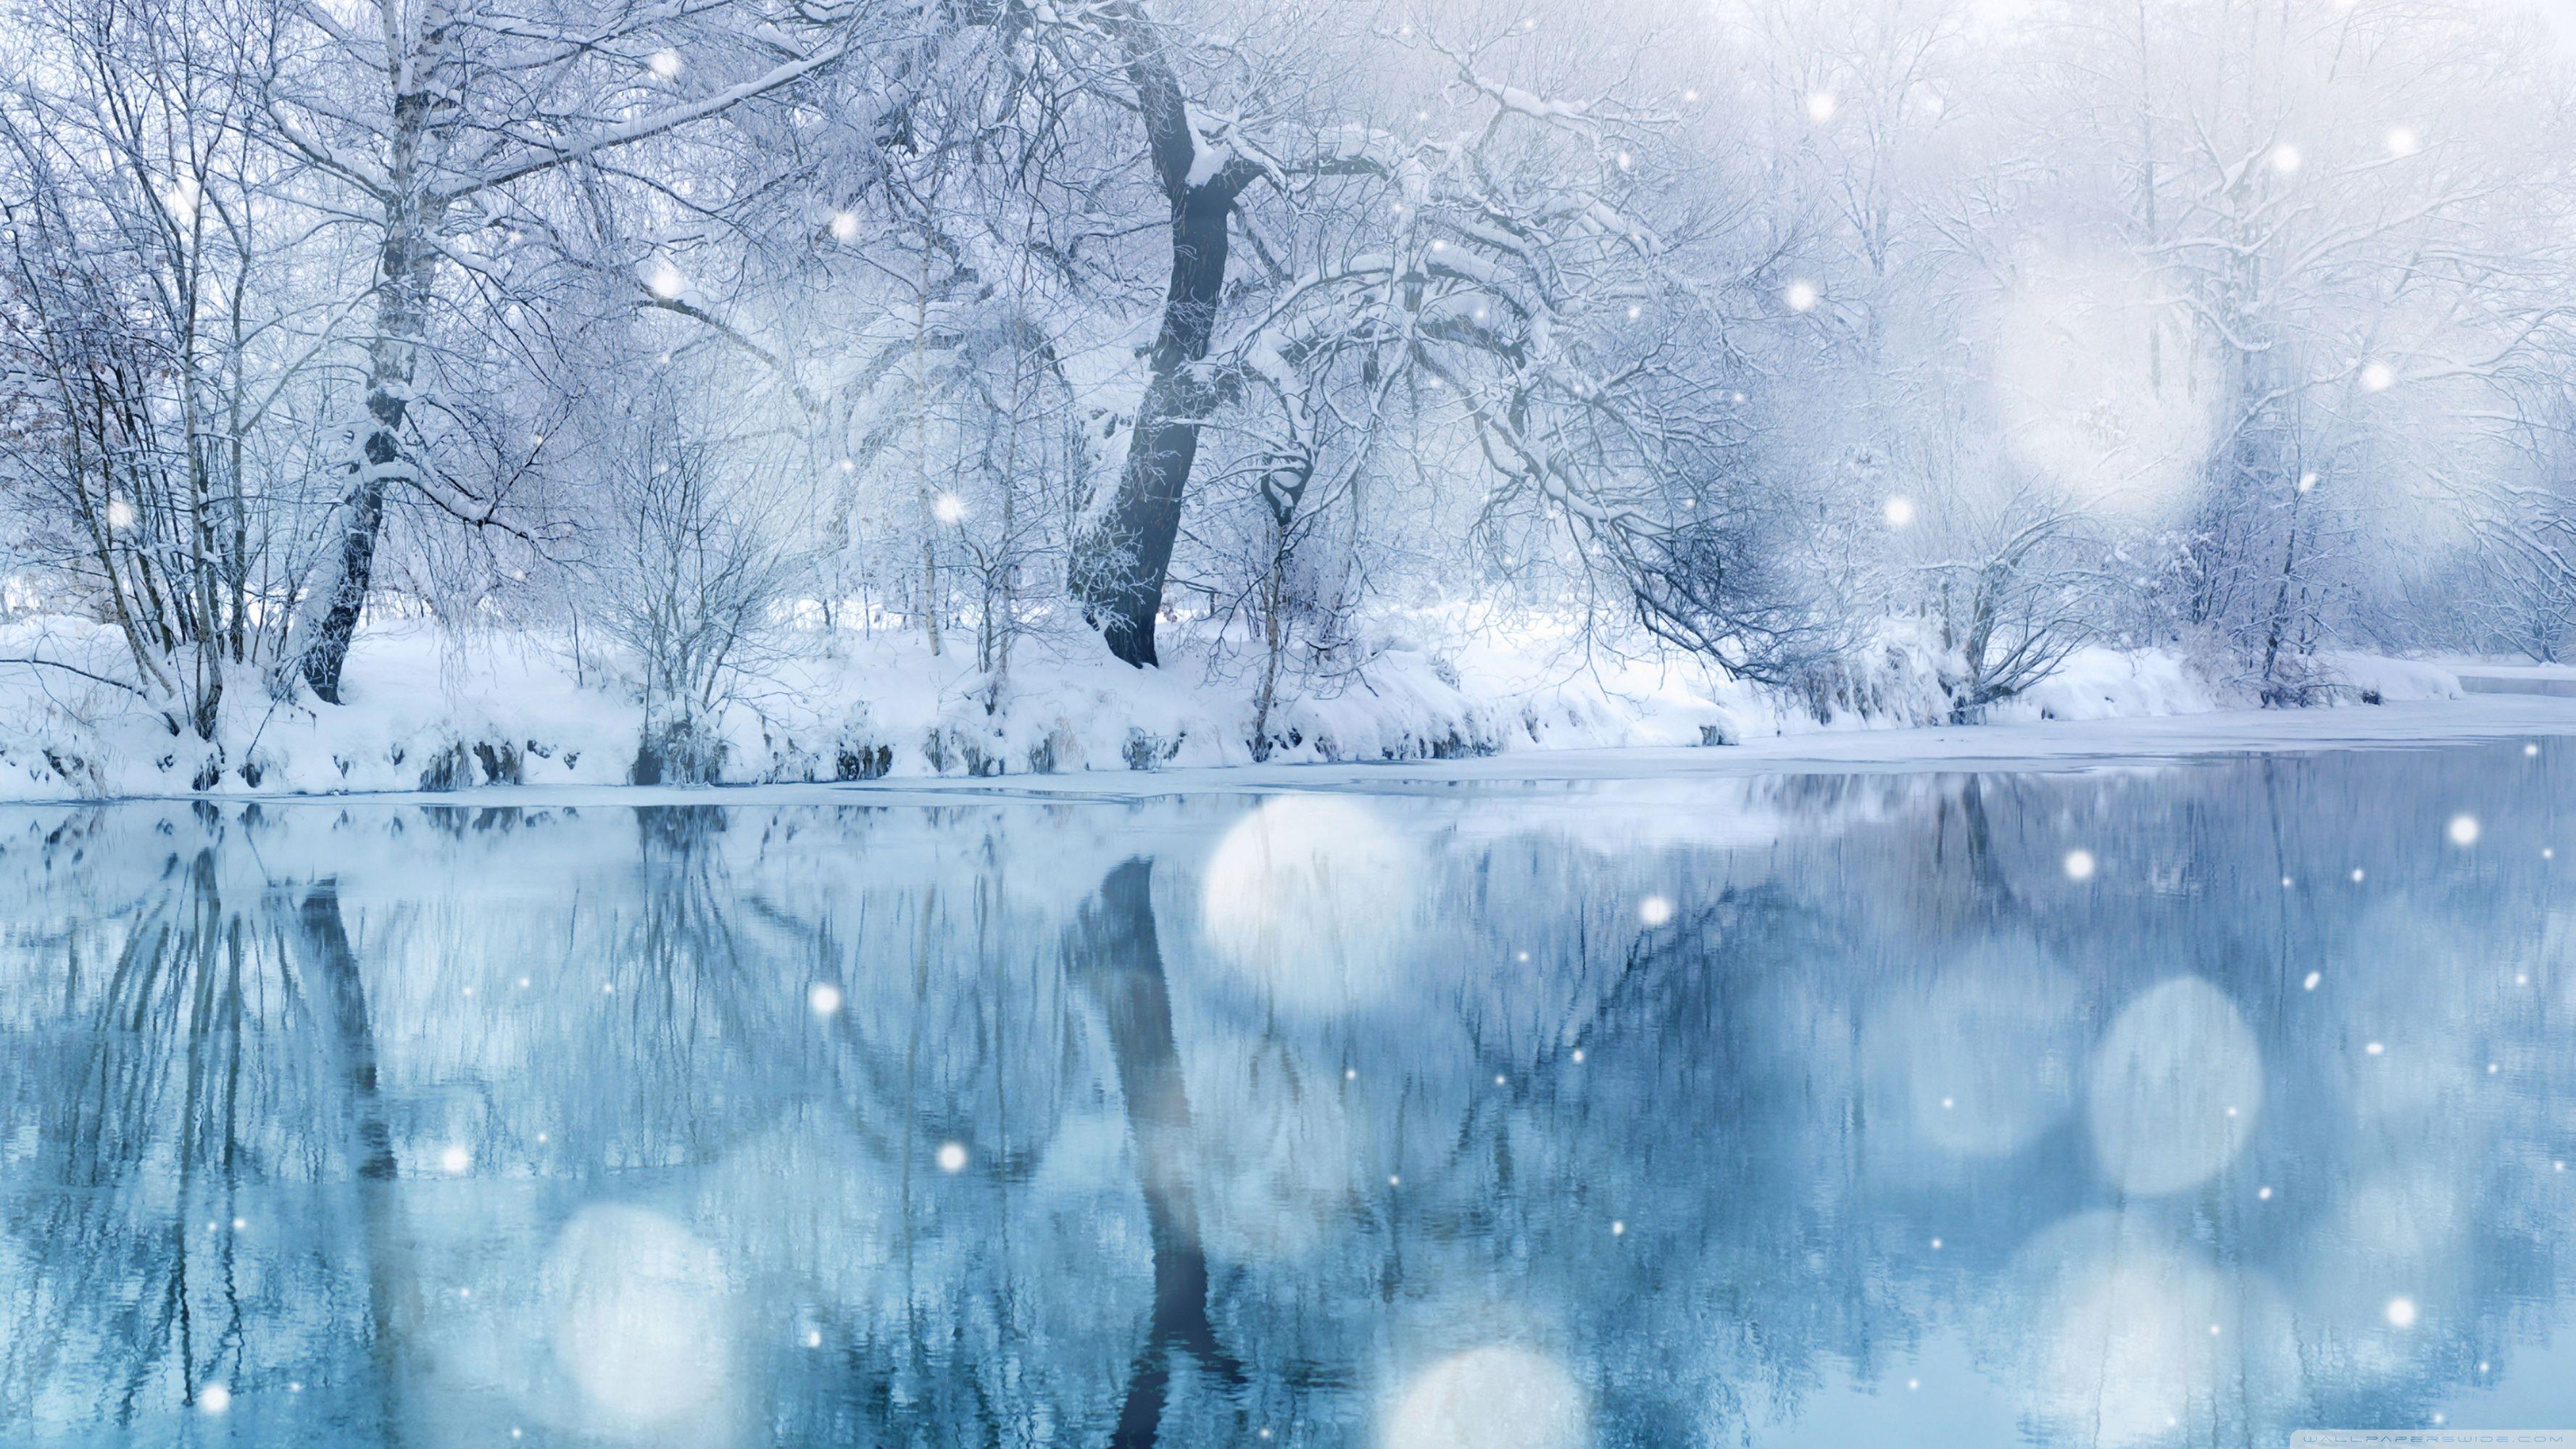 Winter Snowfall Hd Desktop Wallpaper High Definition Mobile Zima Pejzazhi Fotooboi